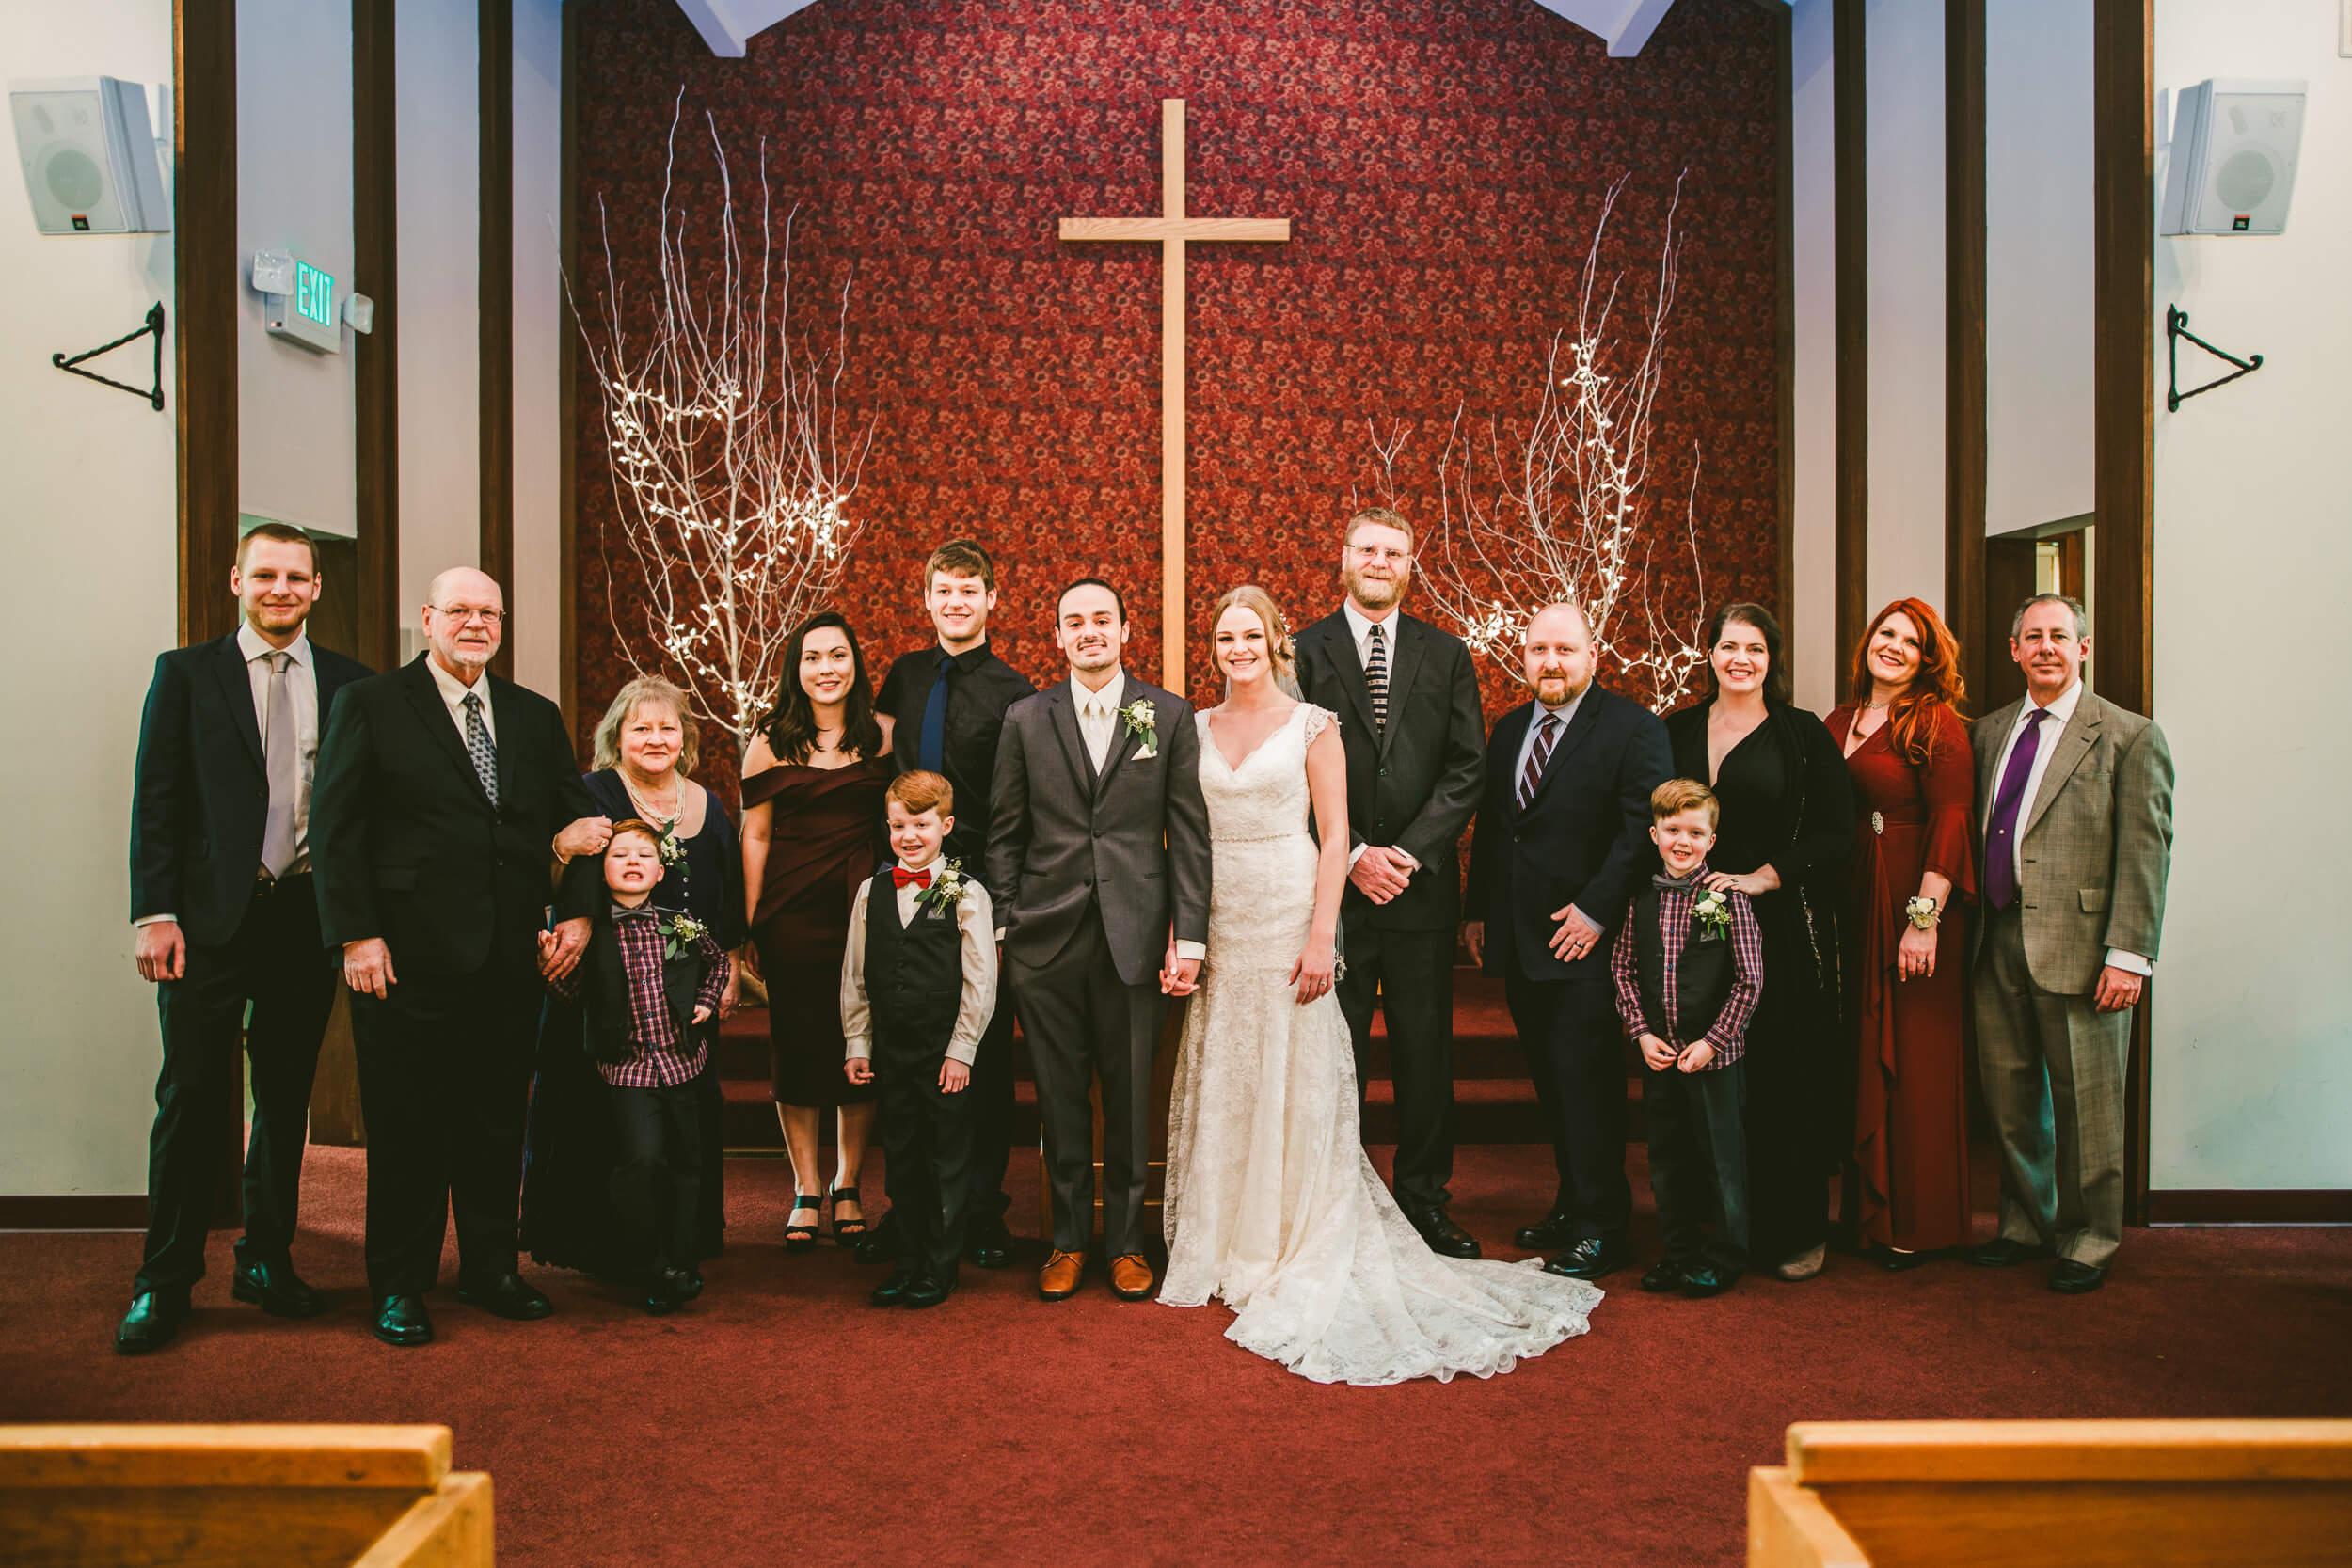 mukogawa winter wedding in spokane (179).jpg